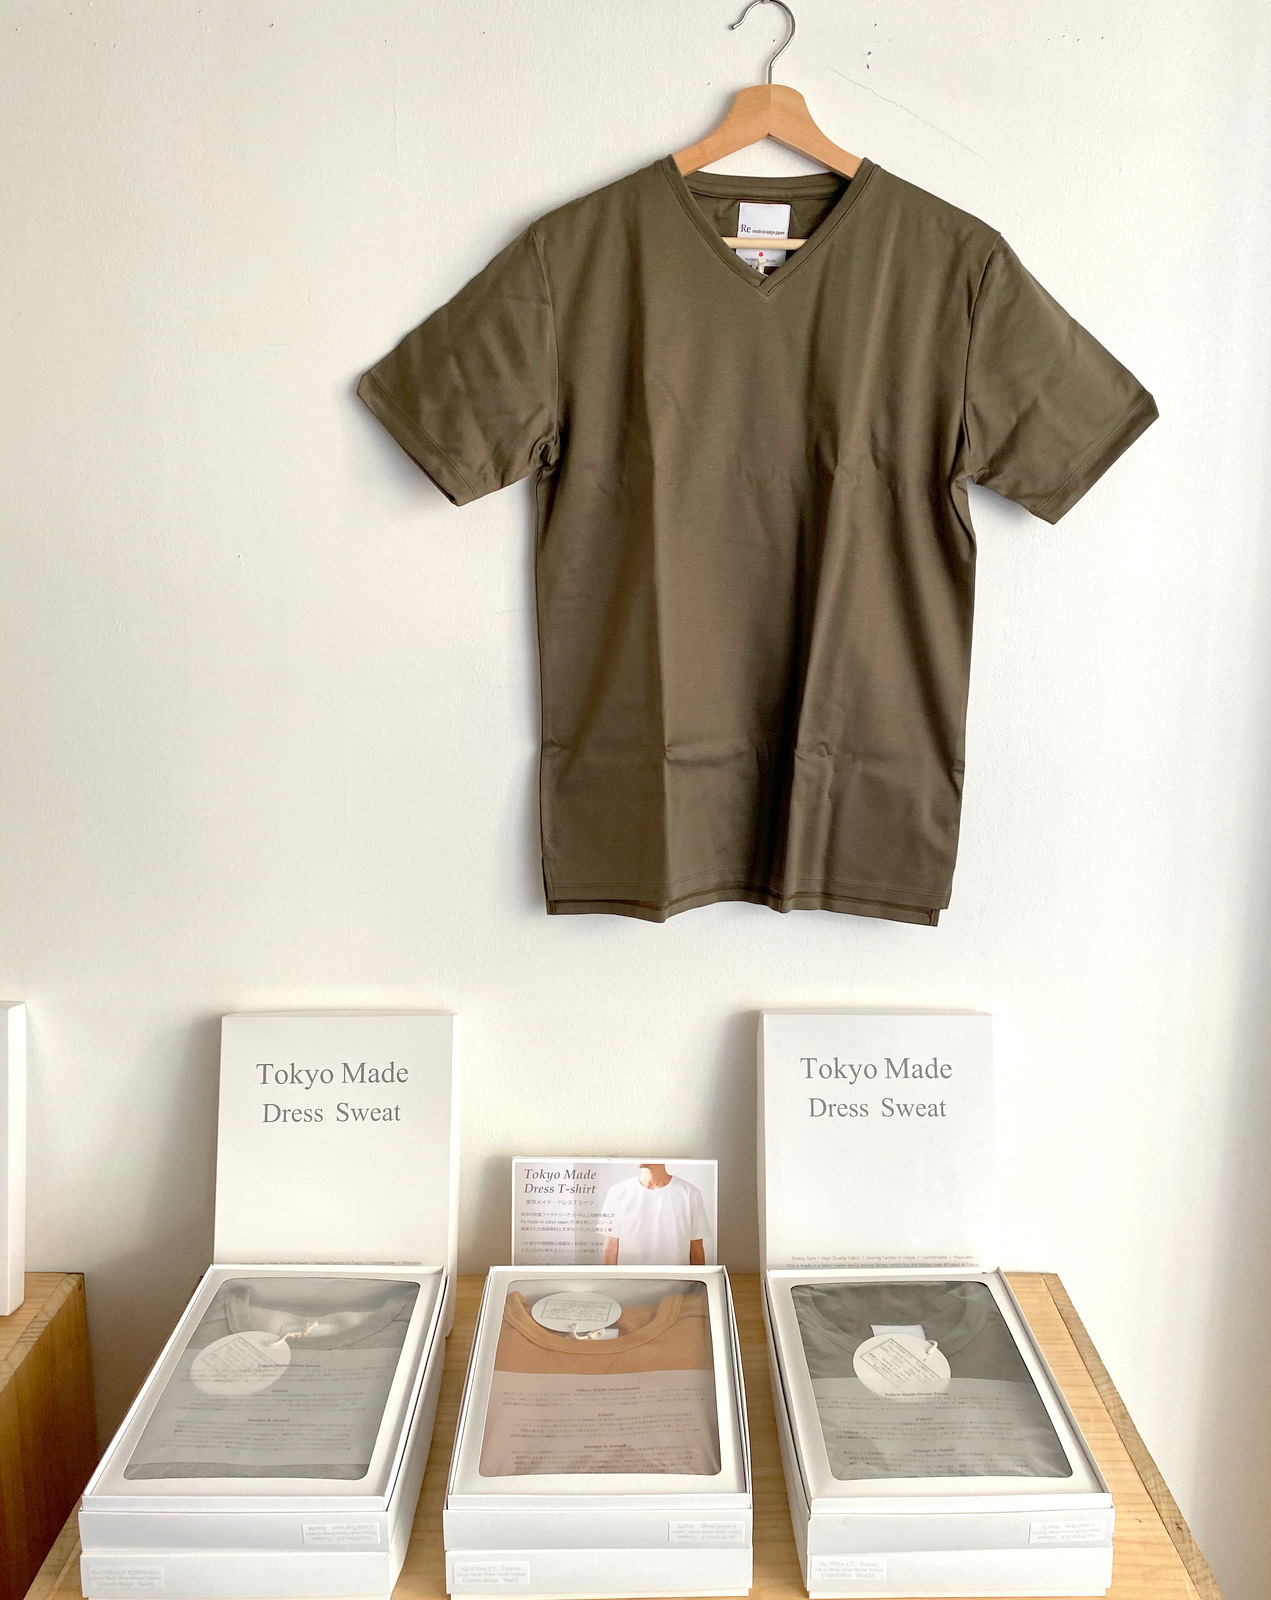 Tokyo Made Dress T-shirt (V-neck)_c0379477_08011548.jpg